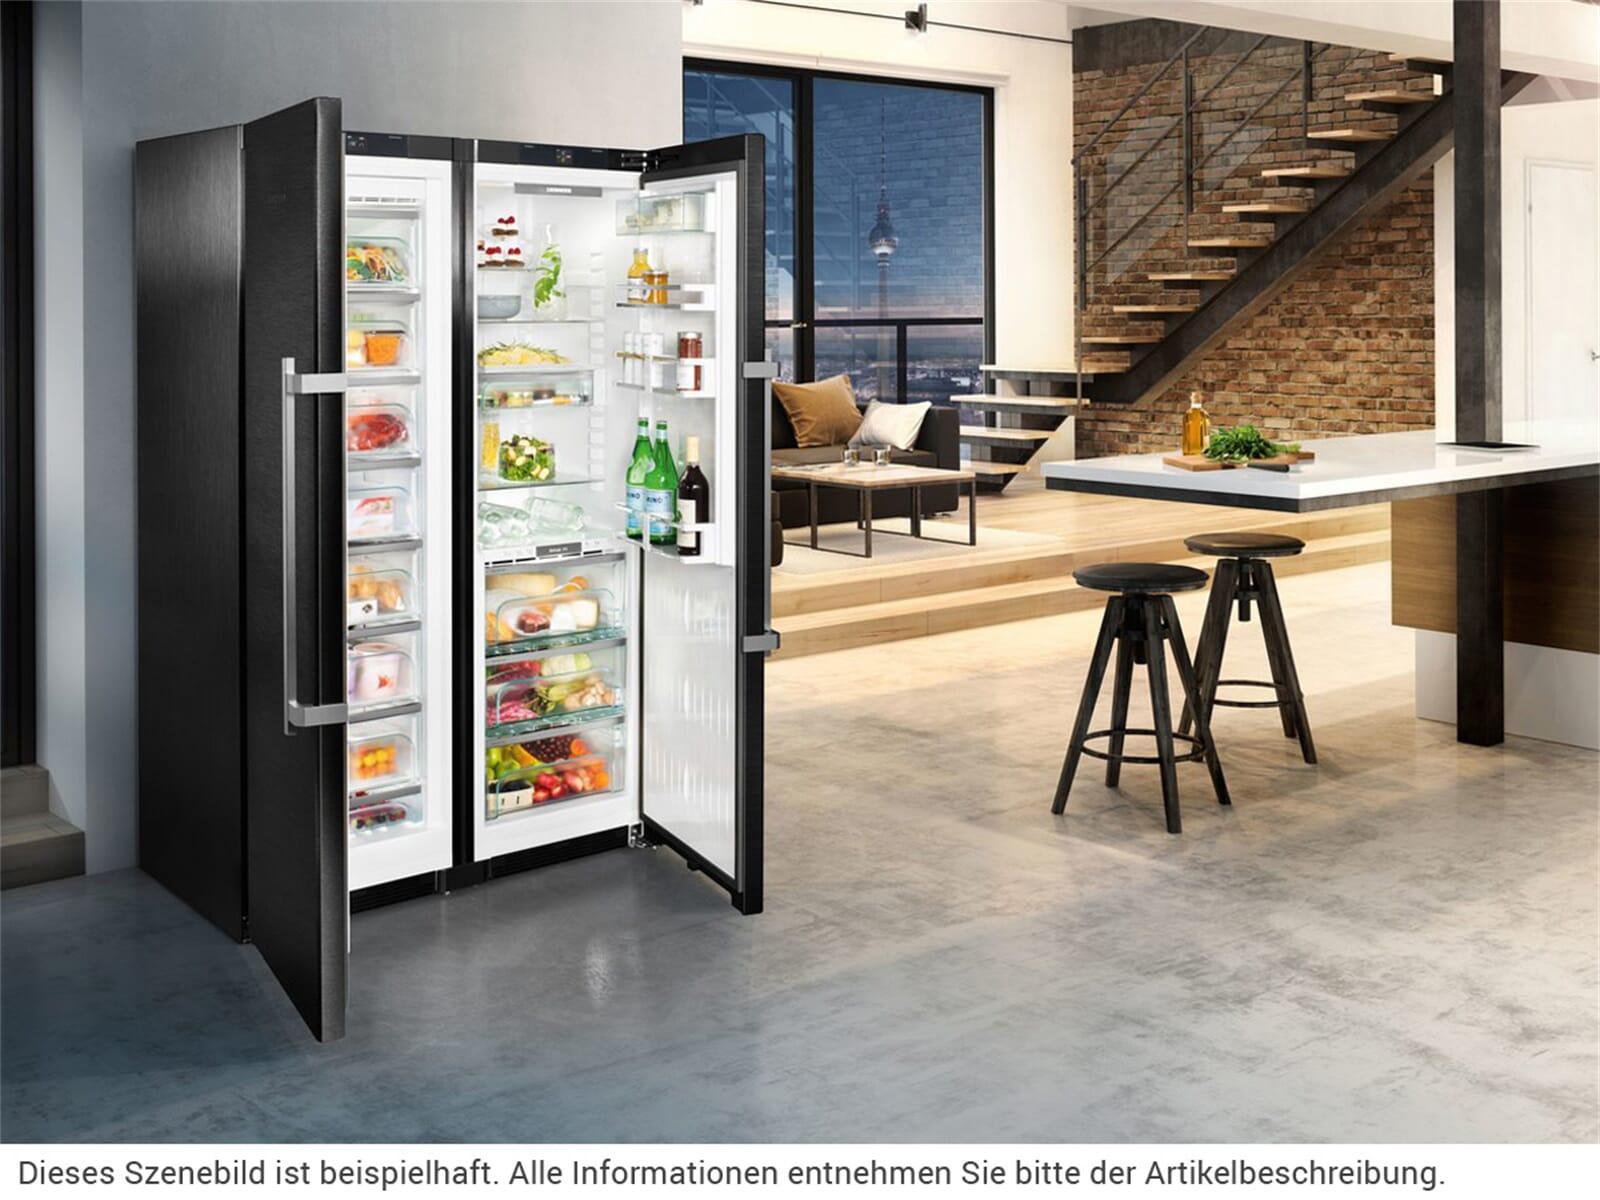 Side By Side Kühlschrank Wasseranschluss Verlängern : Lg gsl icez side by side lg schweiz